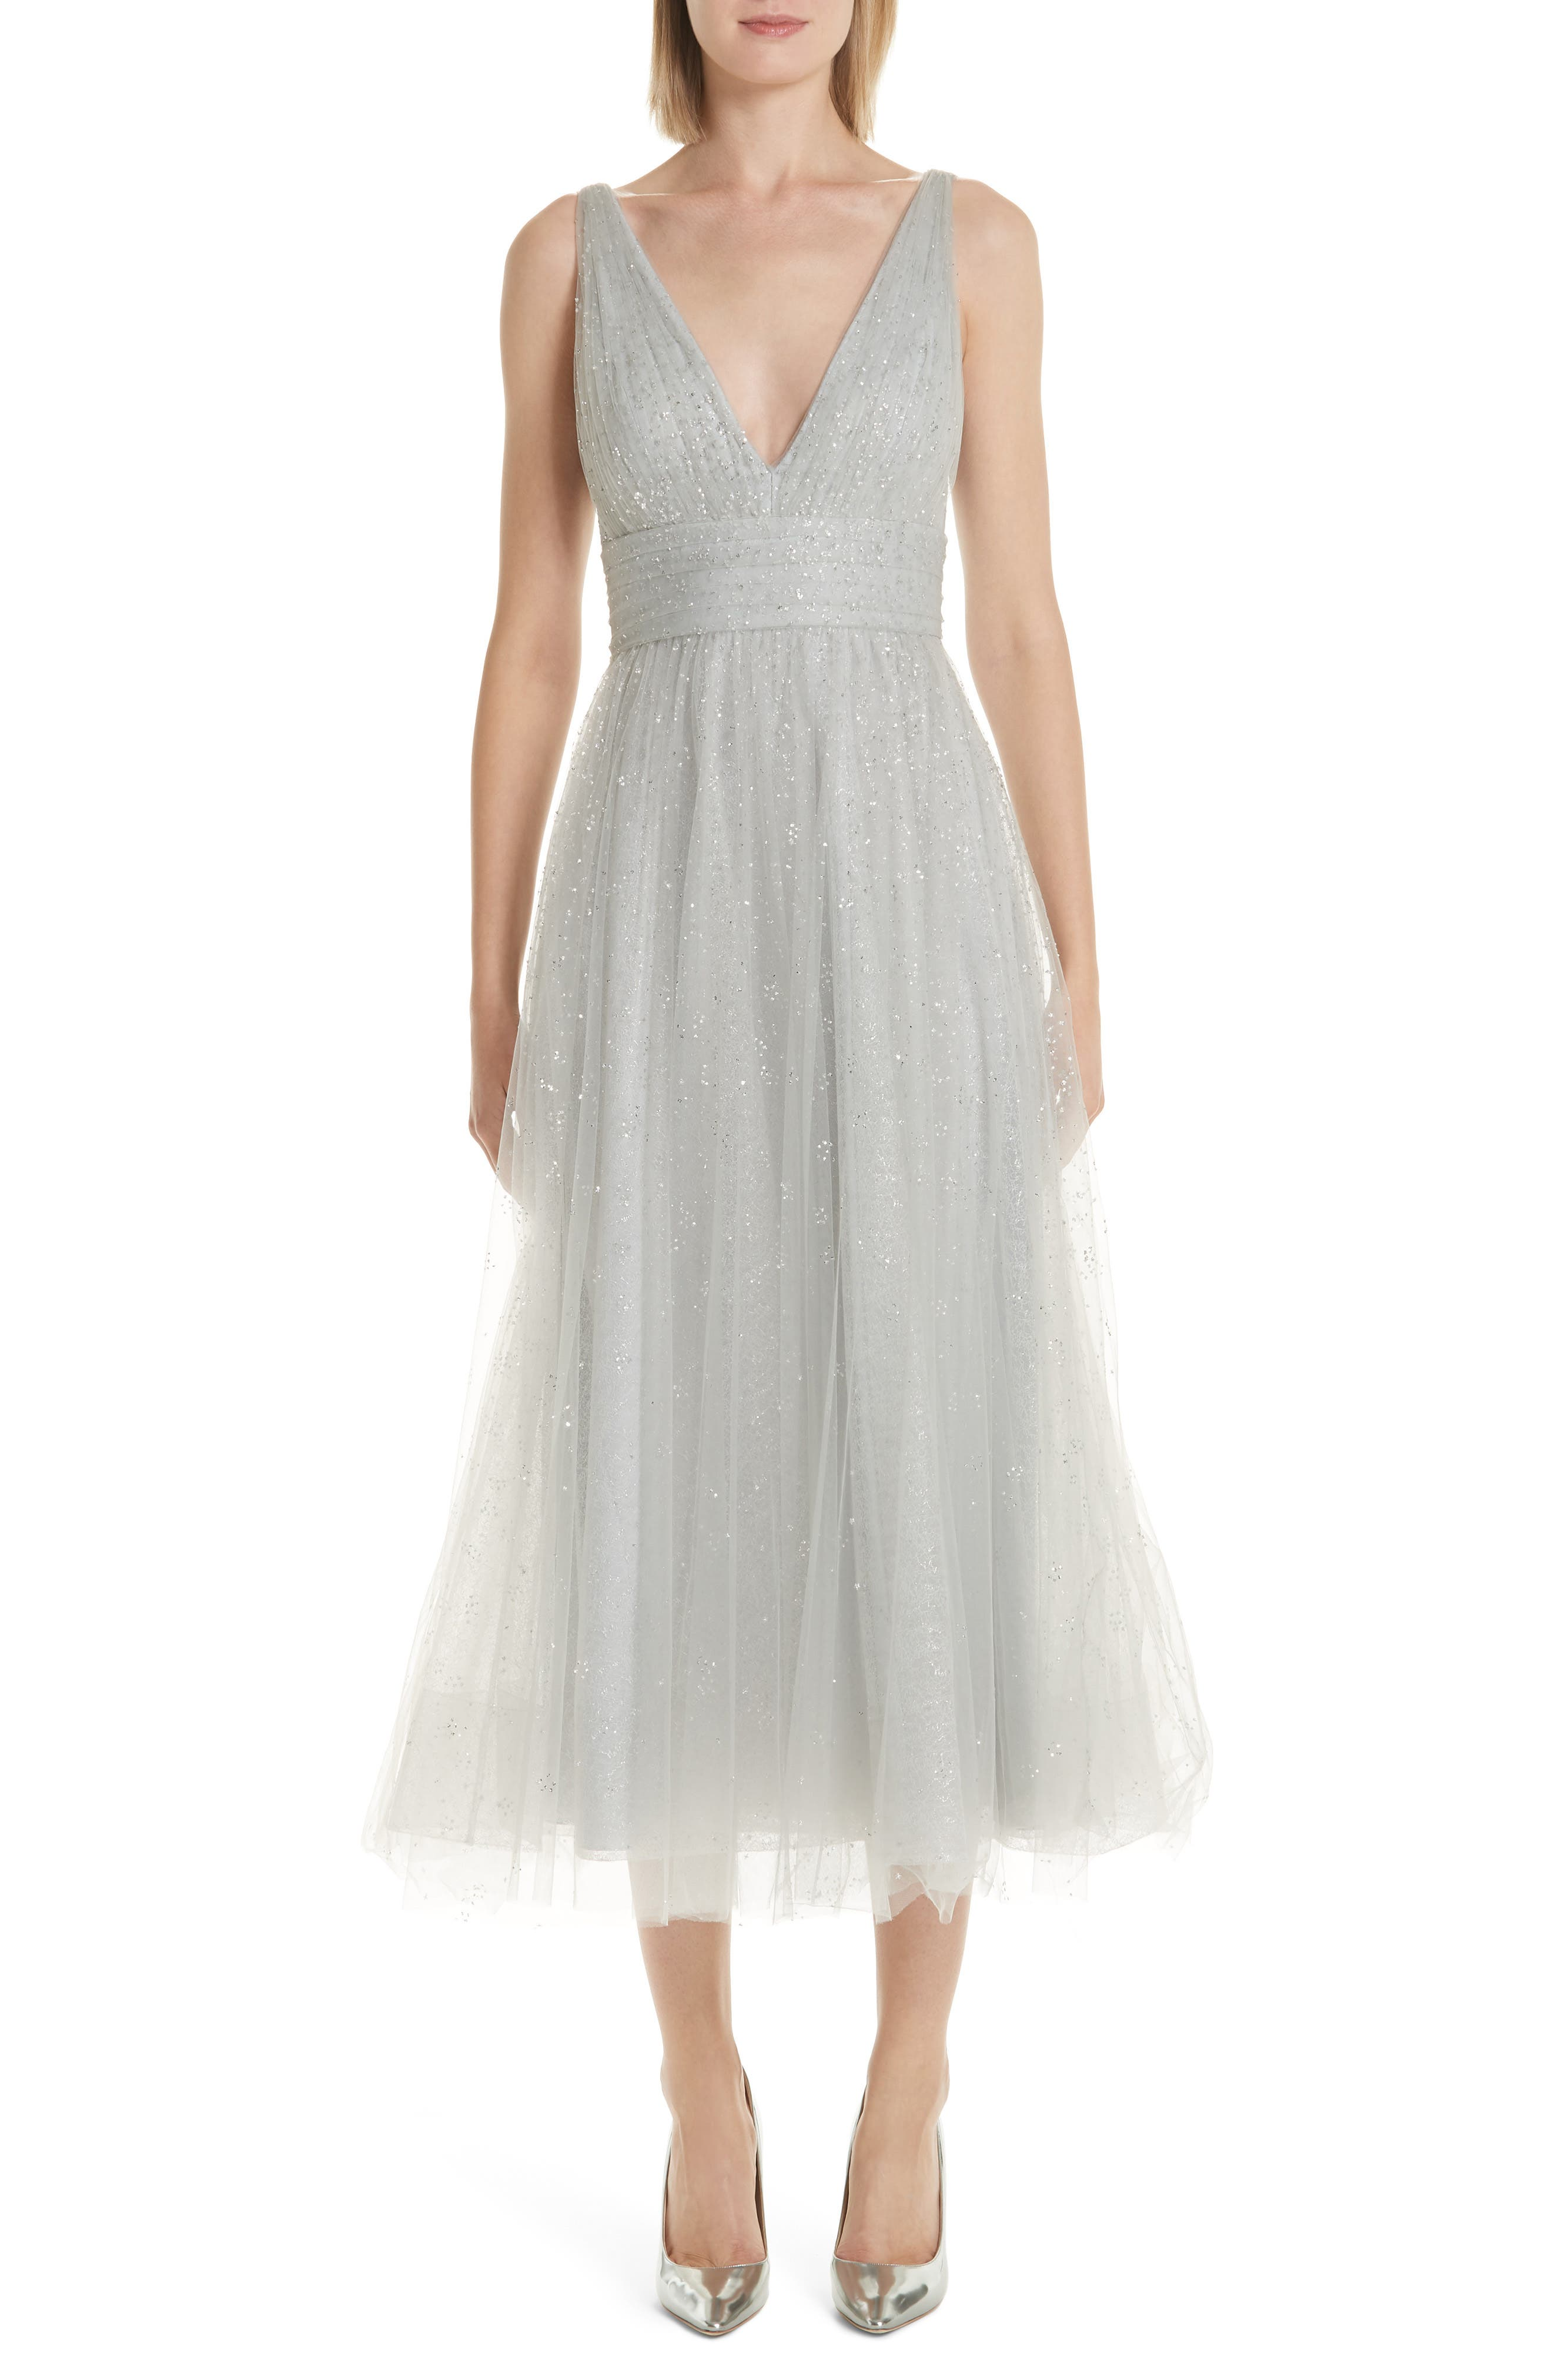 MARCHESA NOTTE,                             Glitter Tulle Tea Length Dress,                             Main thumbnail 1, color,                             SILVER